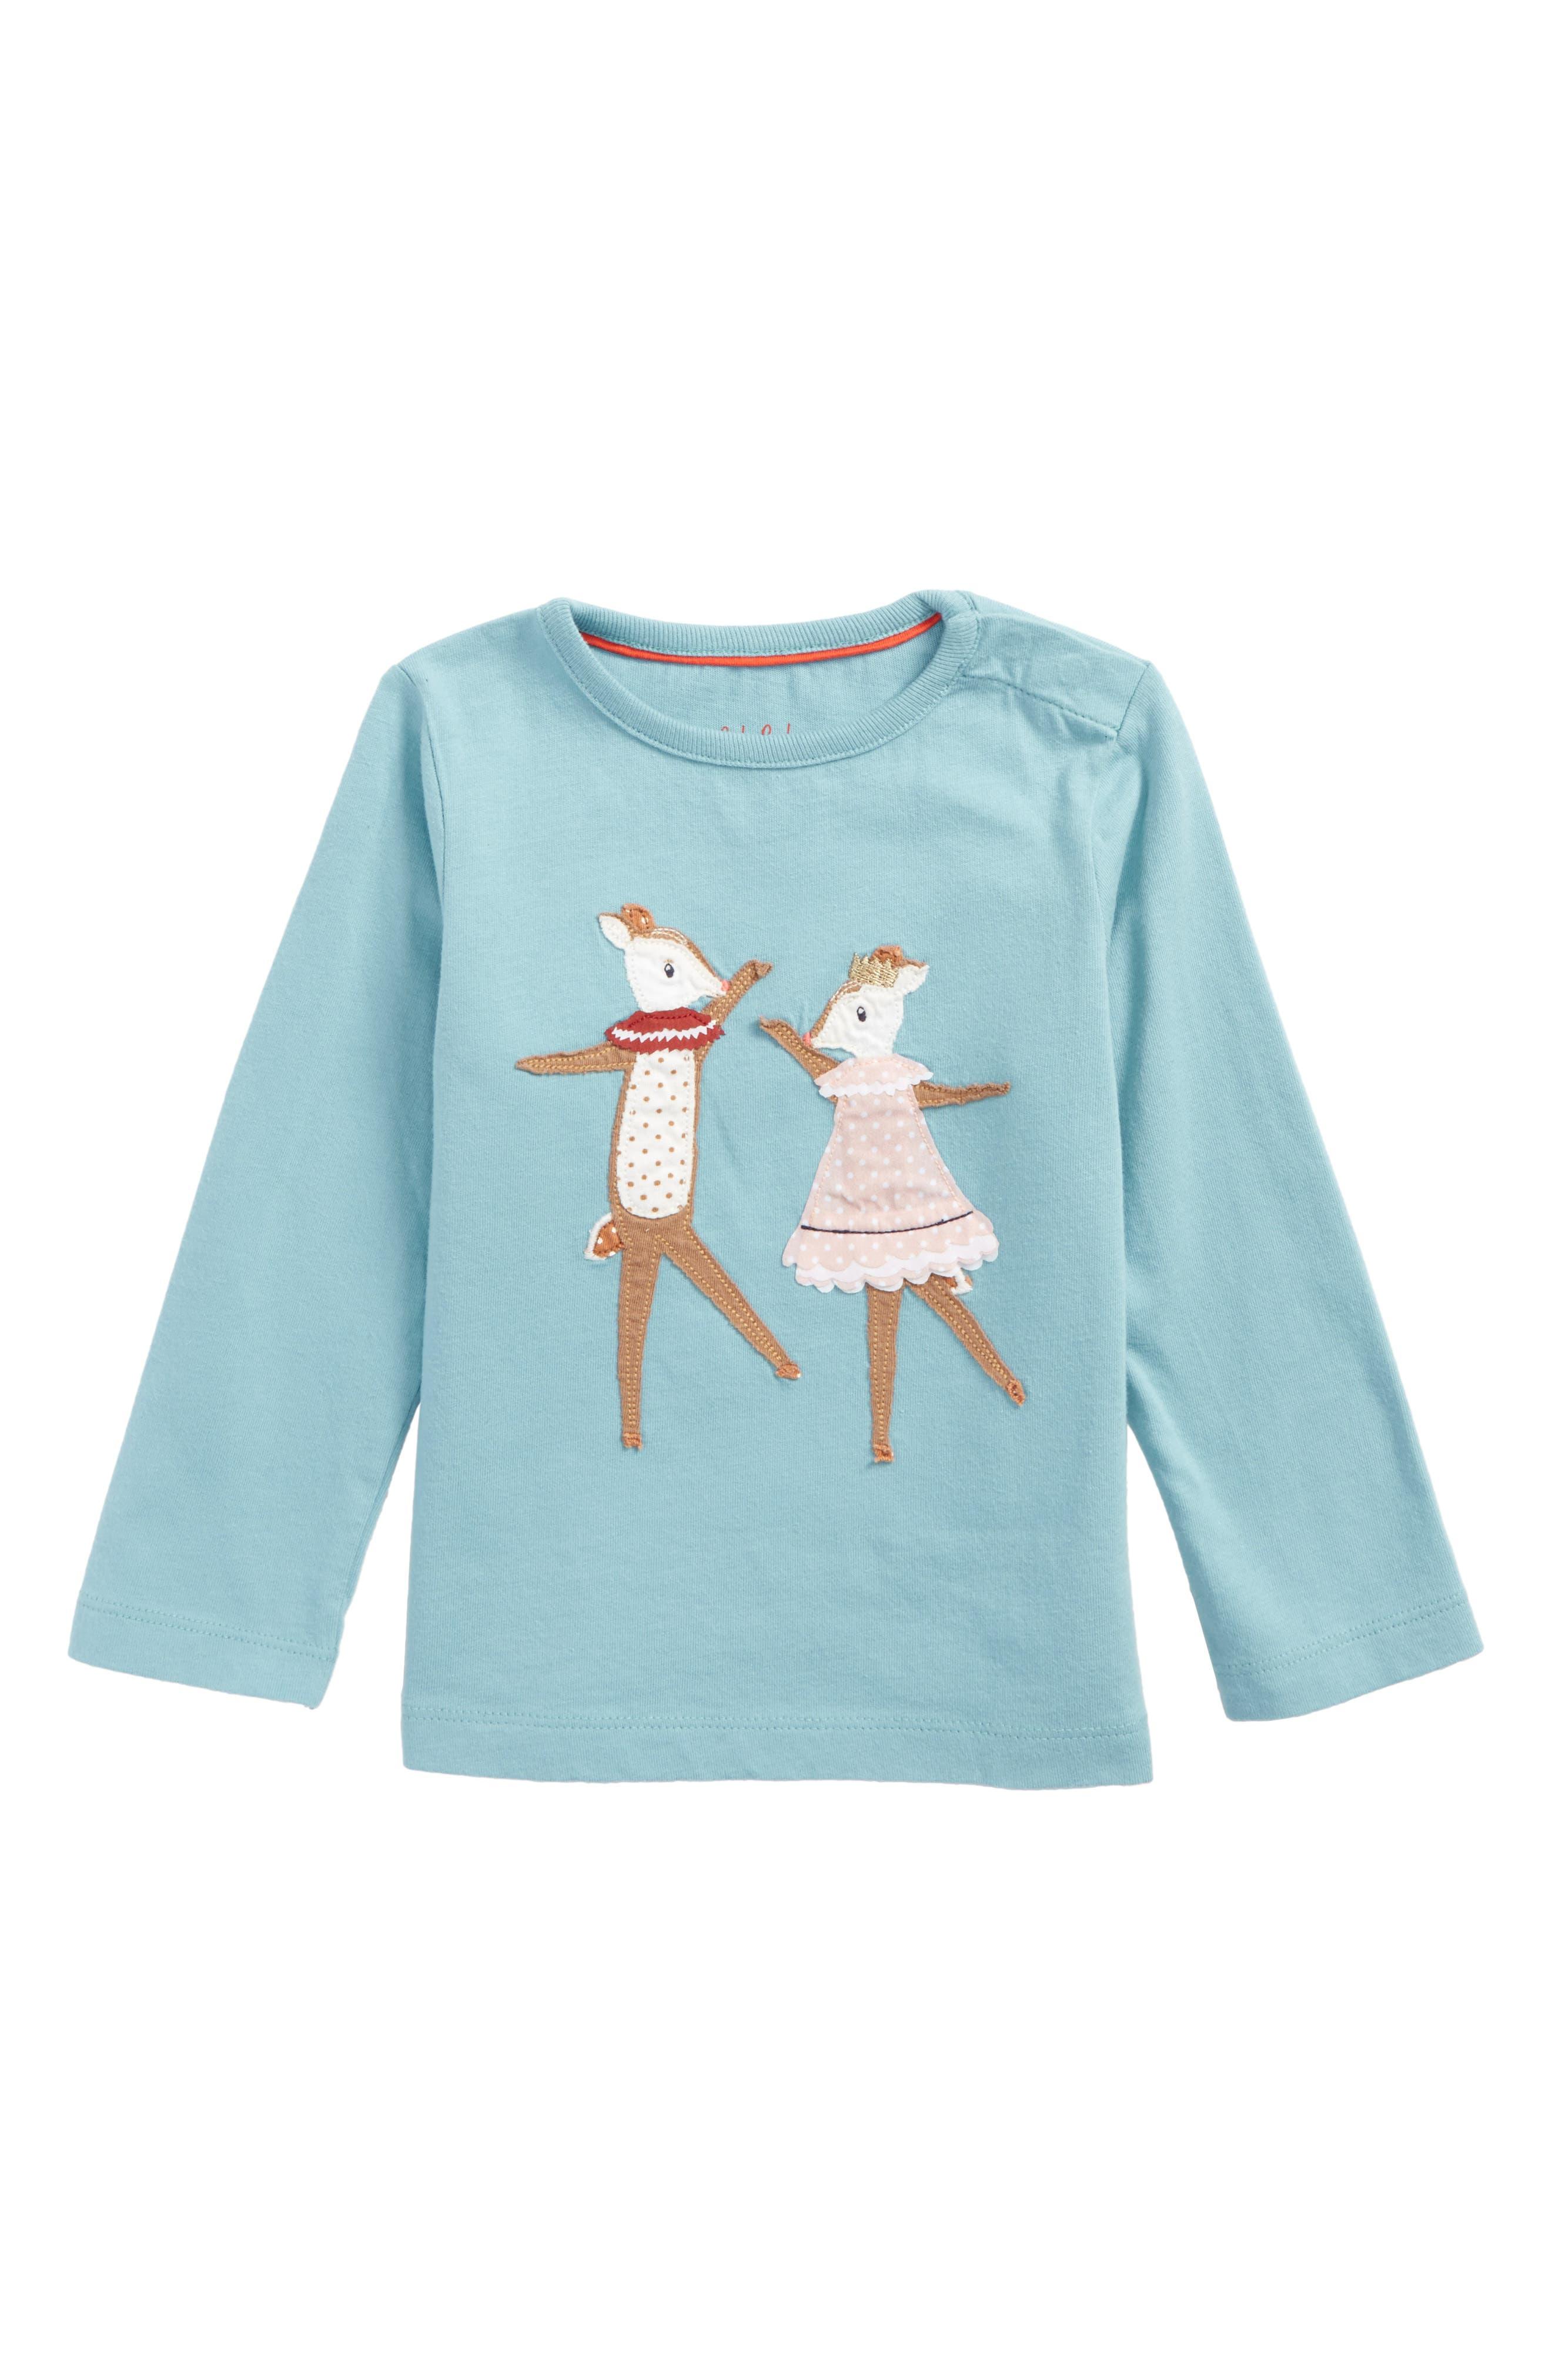 Alternate Image 1 Selected - Mini Boden Fairy Tale Friends Appliqué Tee (Baby Girls)